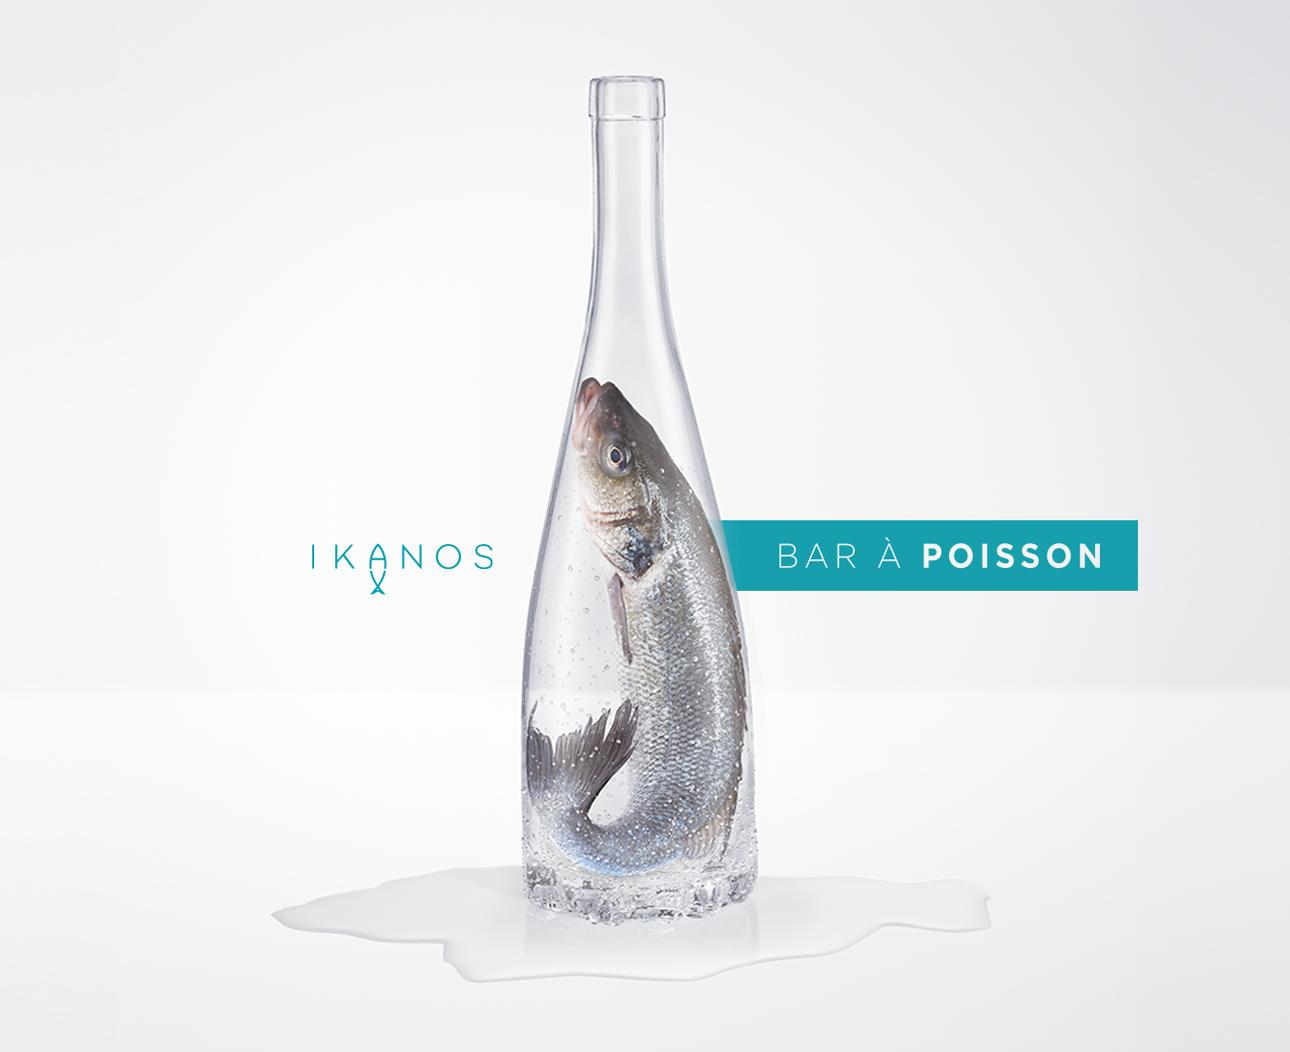 Advertising for the restaurant Ikanos